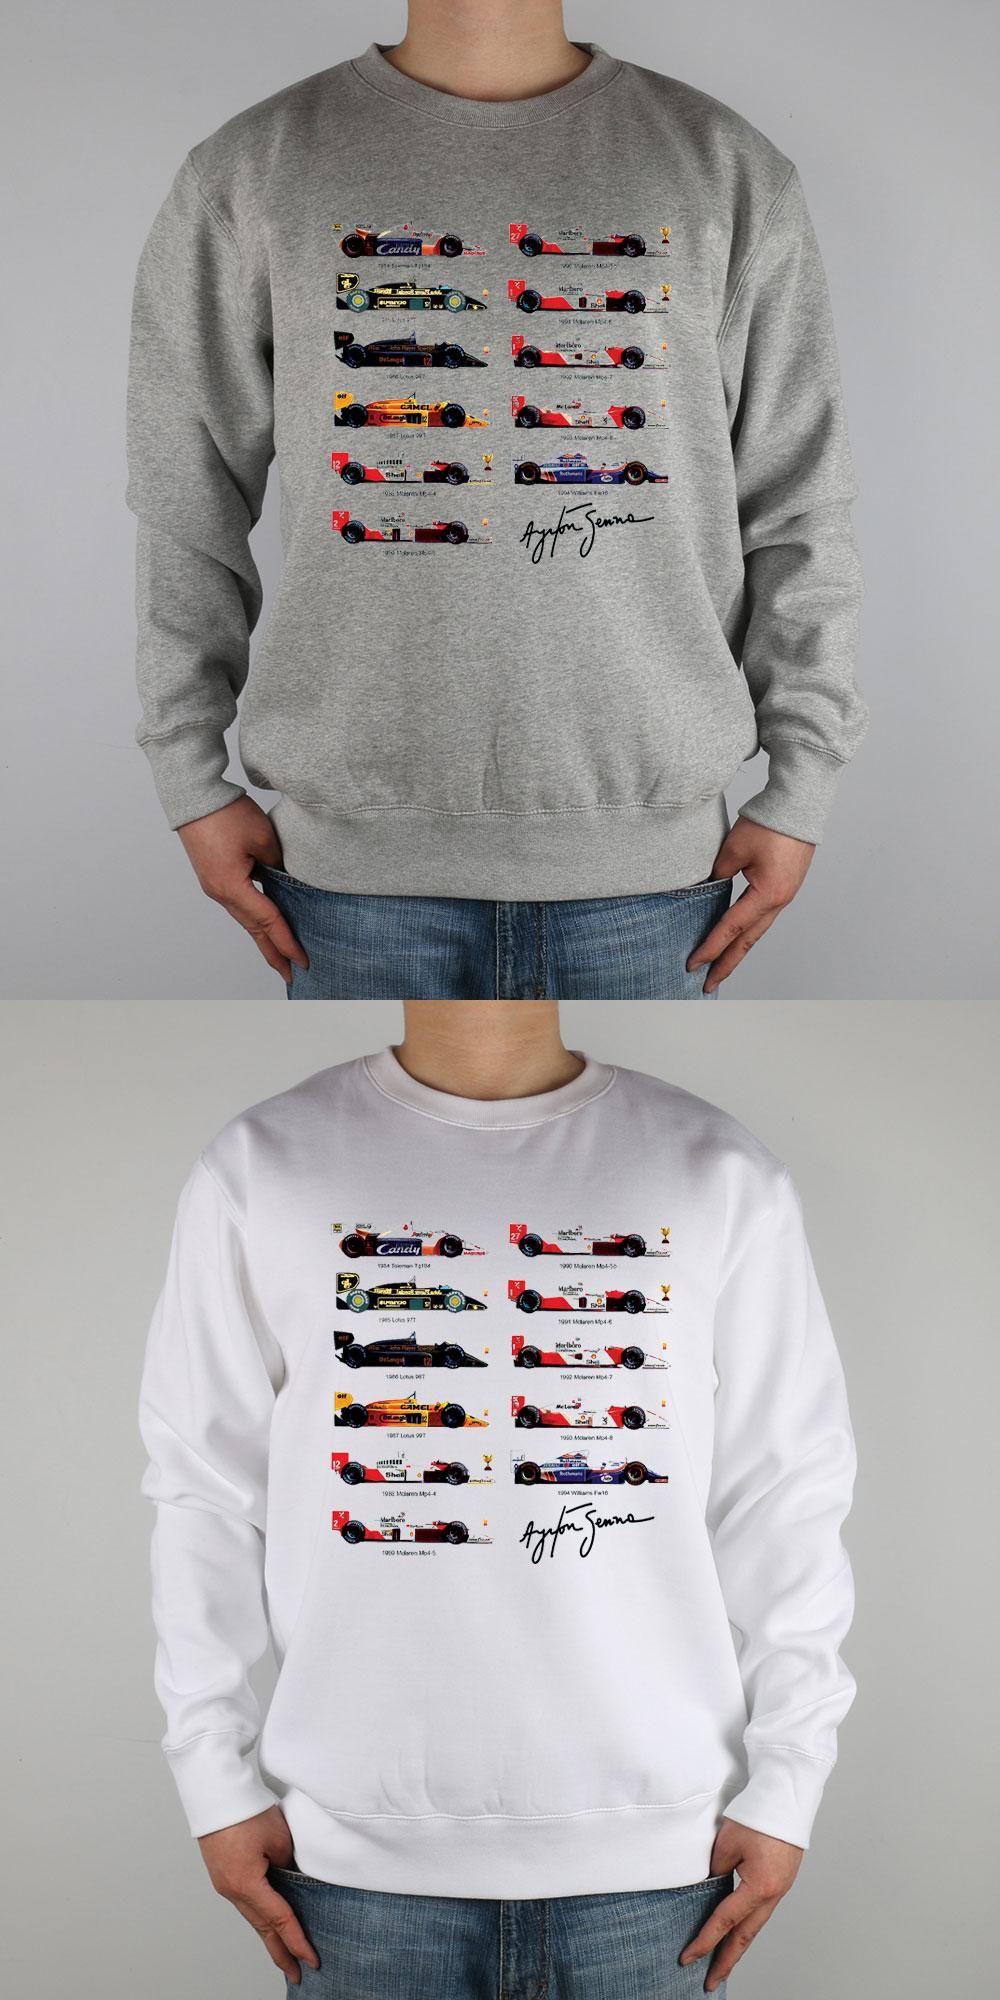 36eb46ab942 All F1 Ayrton Senna sennacars Sweatshirts Thick Combed Cotton ...